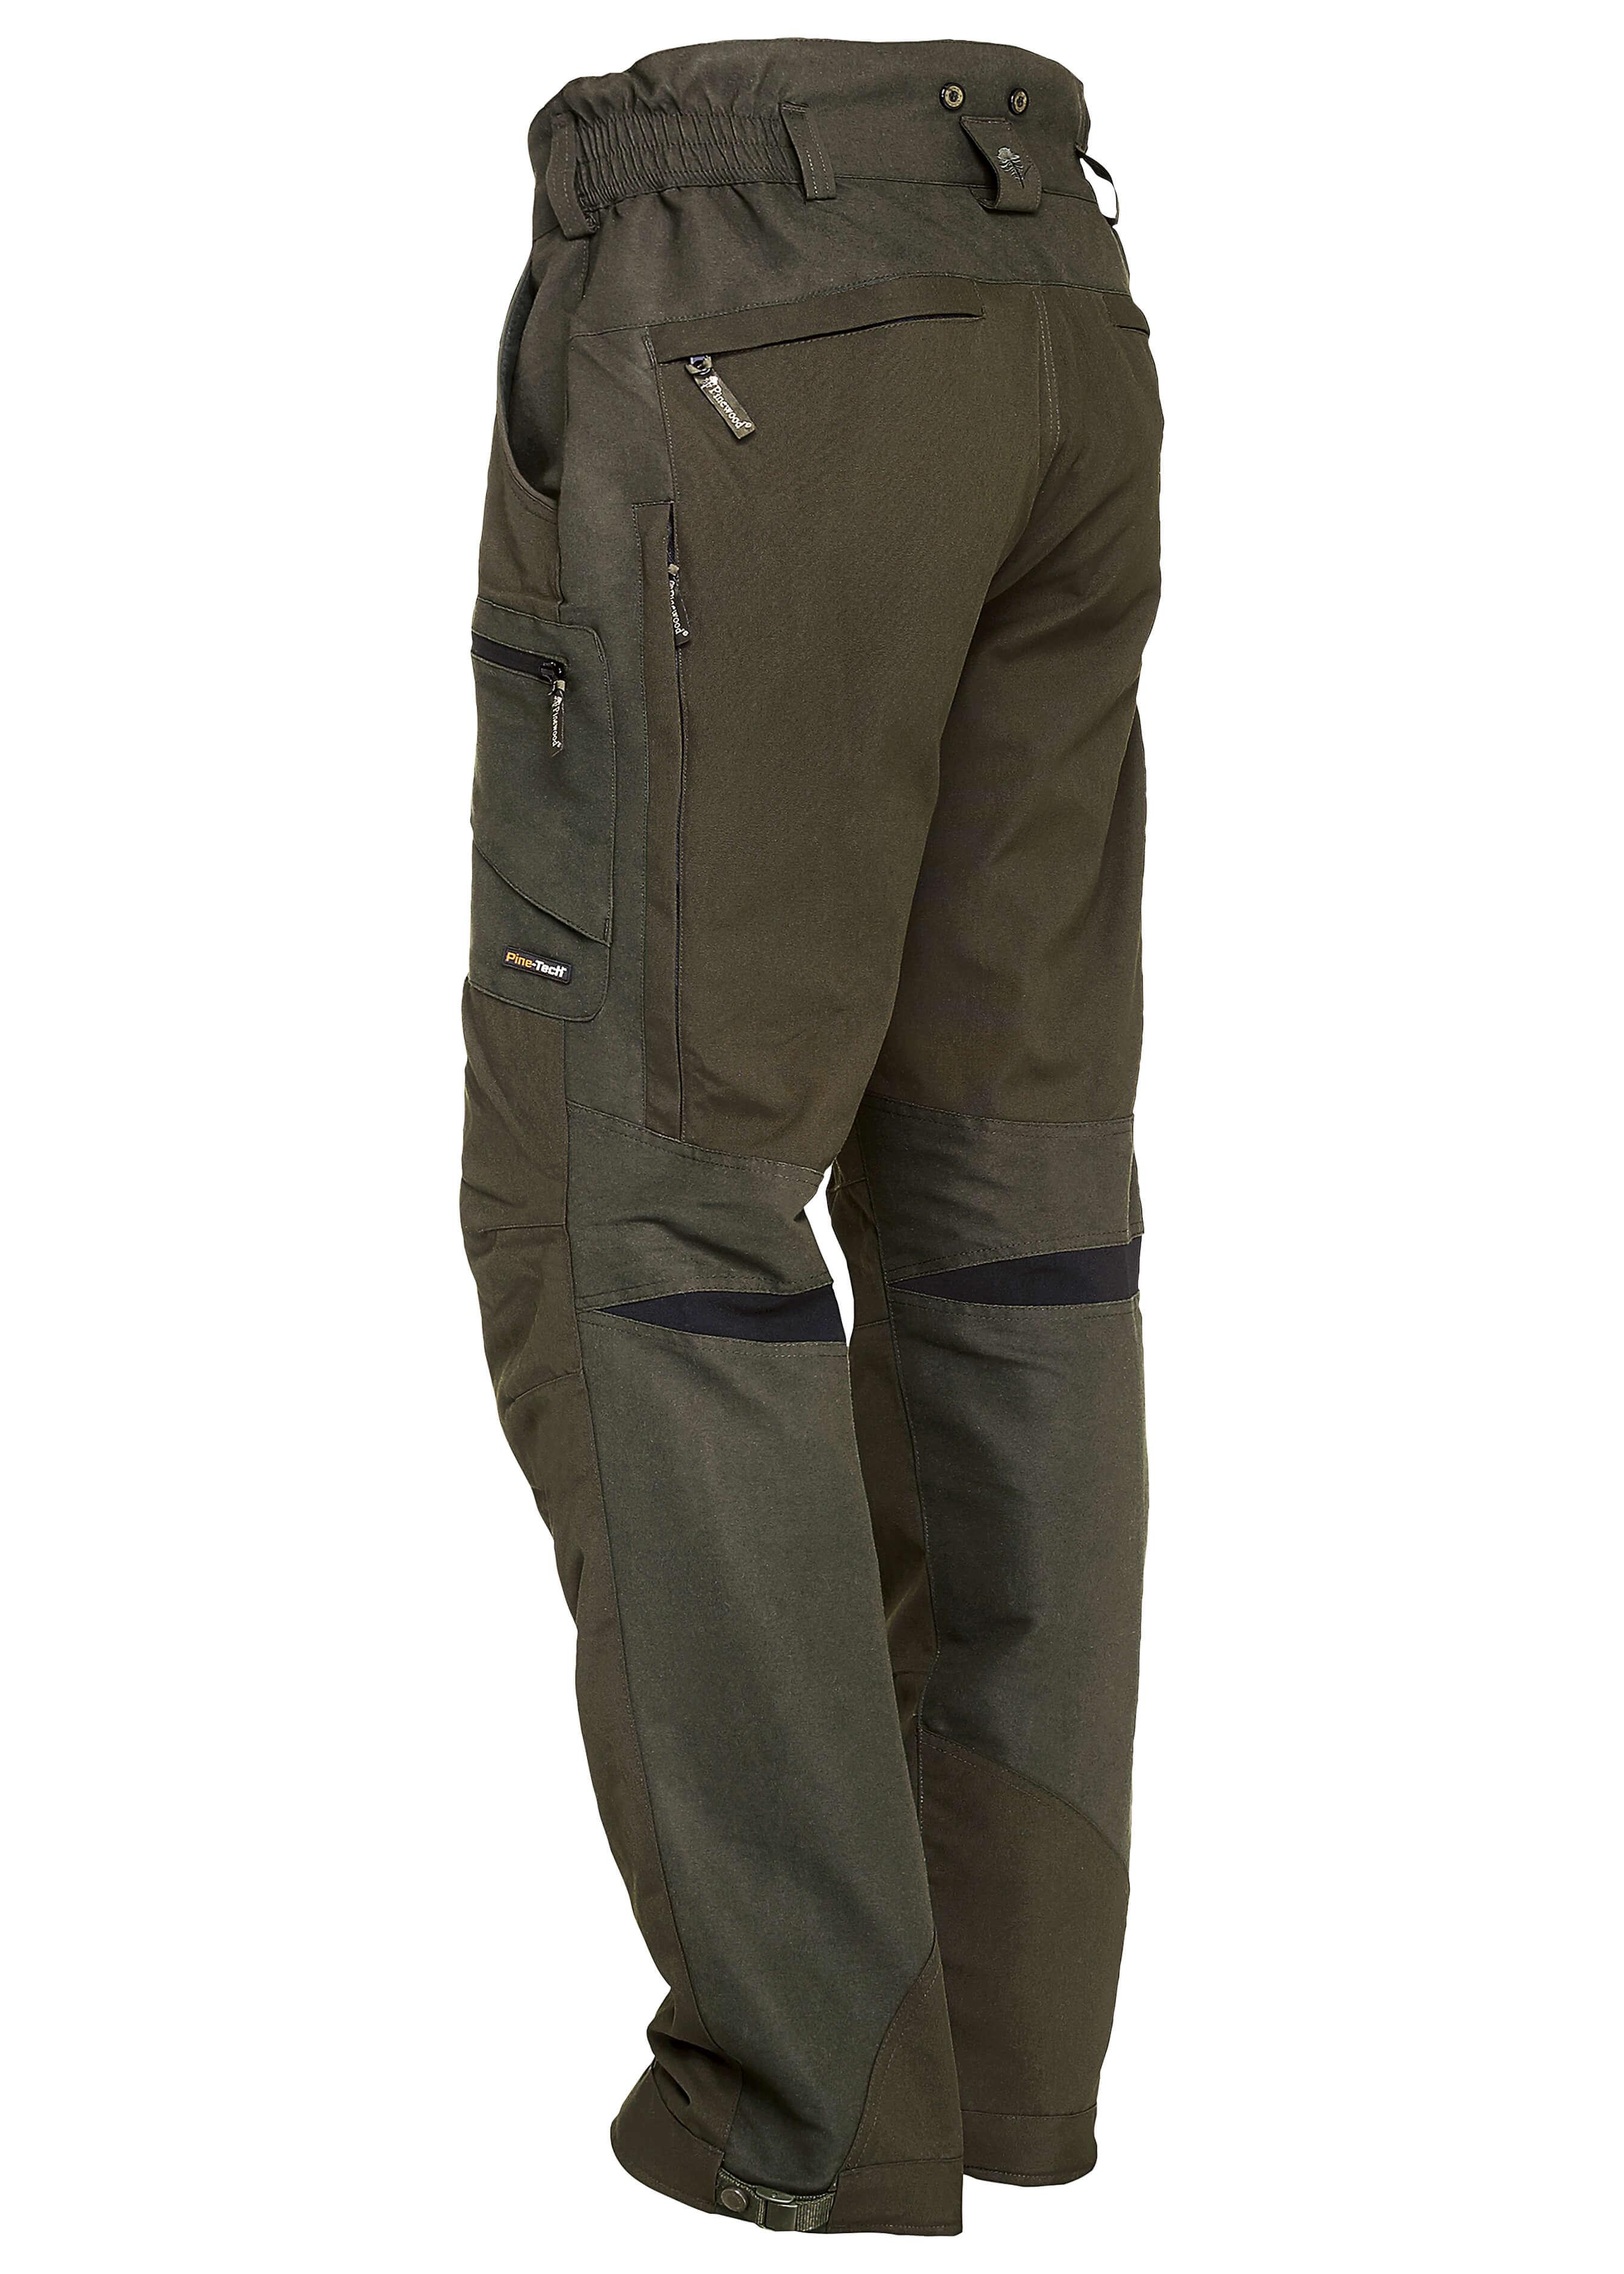 Pinewood Arbeits- und Jagdhose Hunter Pro Extreme (7988) L1418042 1